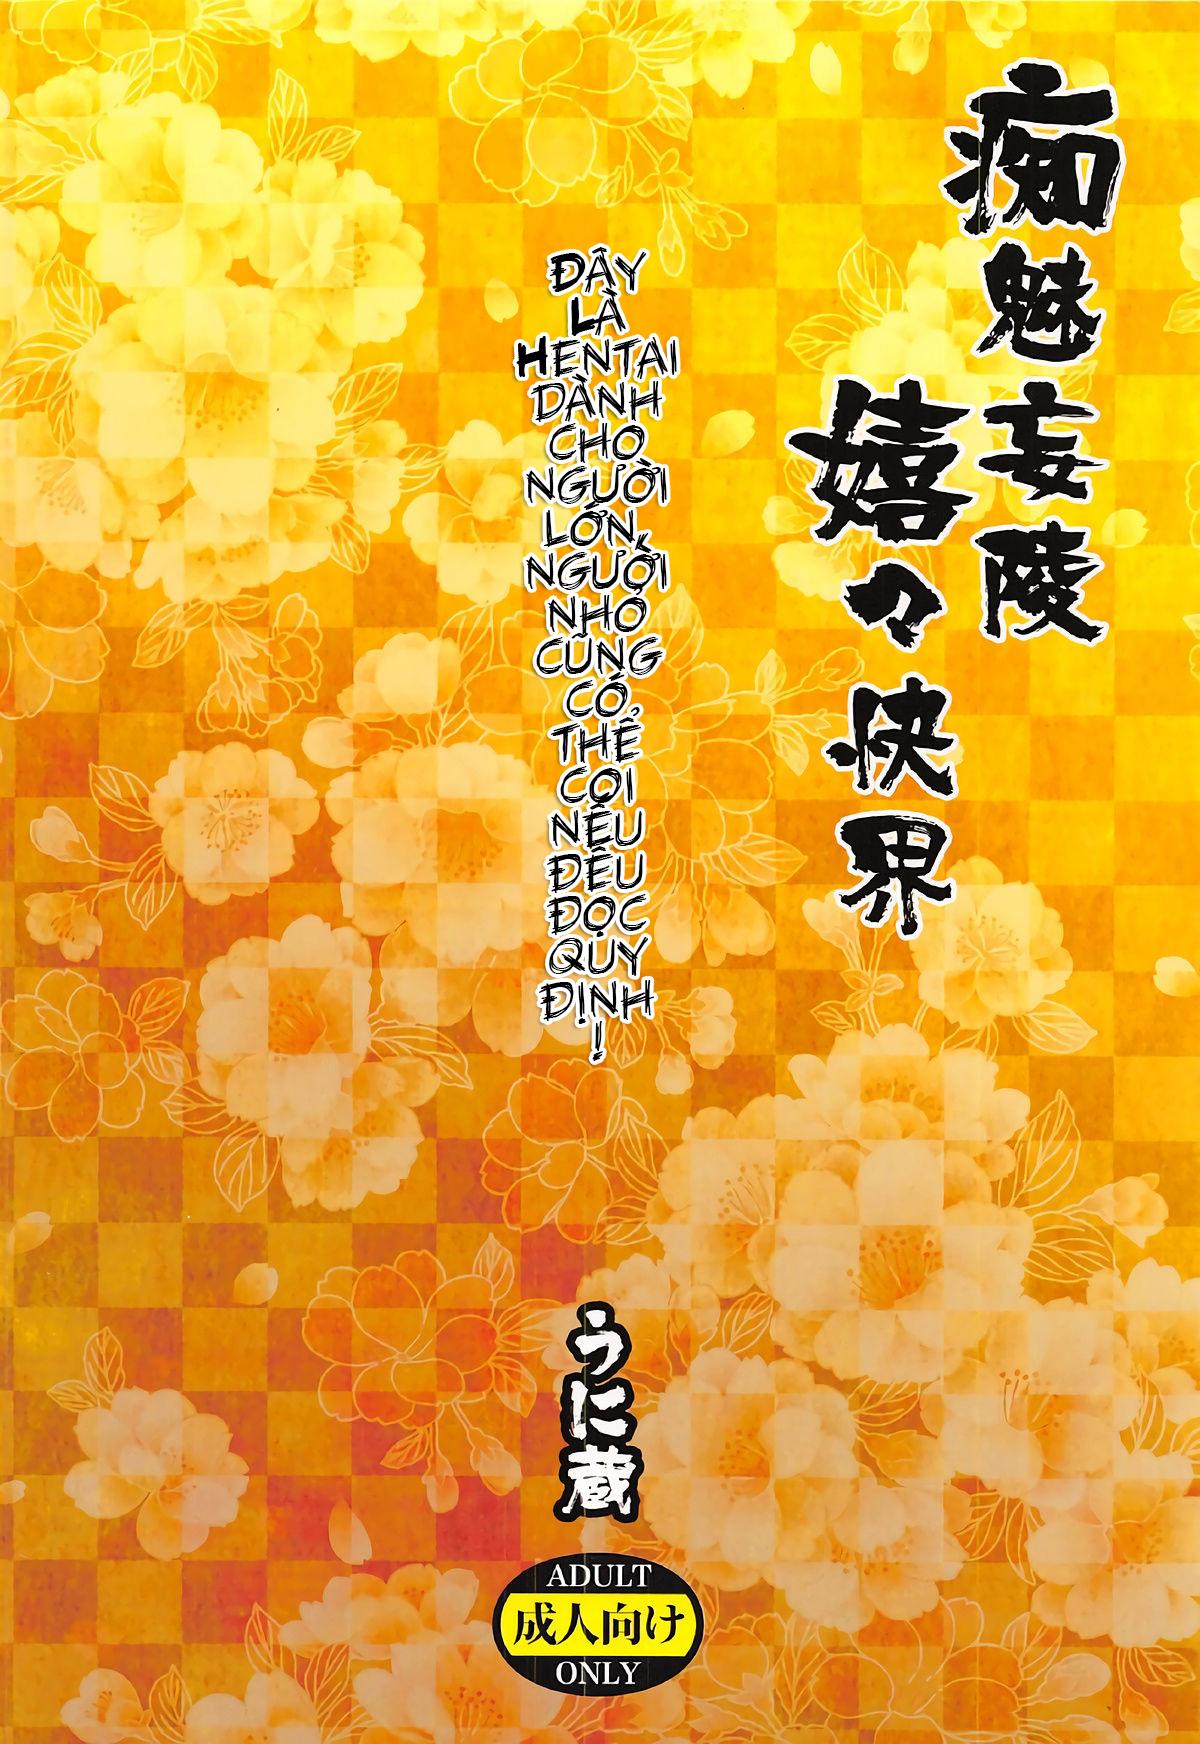 HentaiVN.net - Ảnh 24 - Chimimouryou Kikikaikai (Fate/Grand Order) [Việt Sub] - [うに蔵 (うに蔵)] 痴魅妄陵嬉々快界 (Fate/Grand Order) - Oneshot